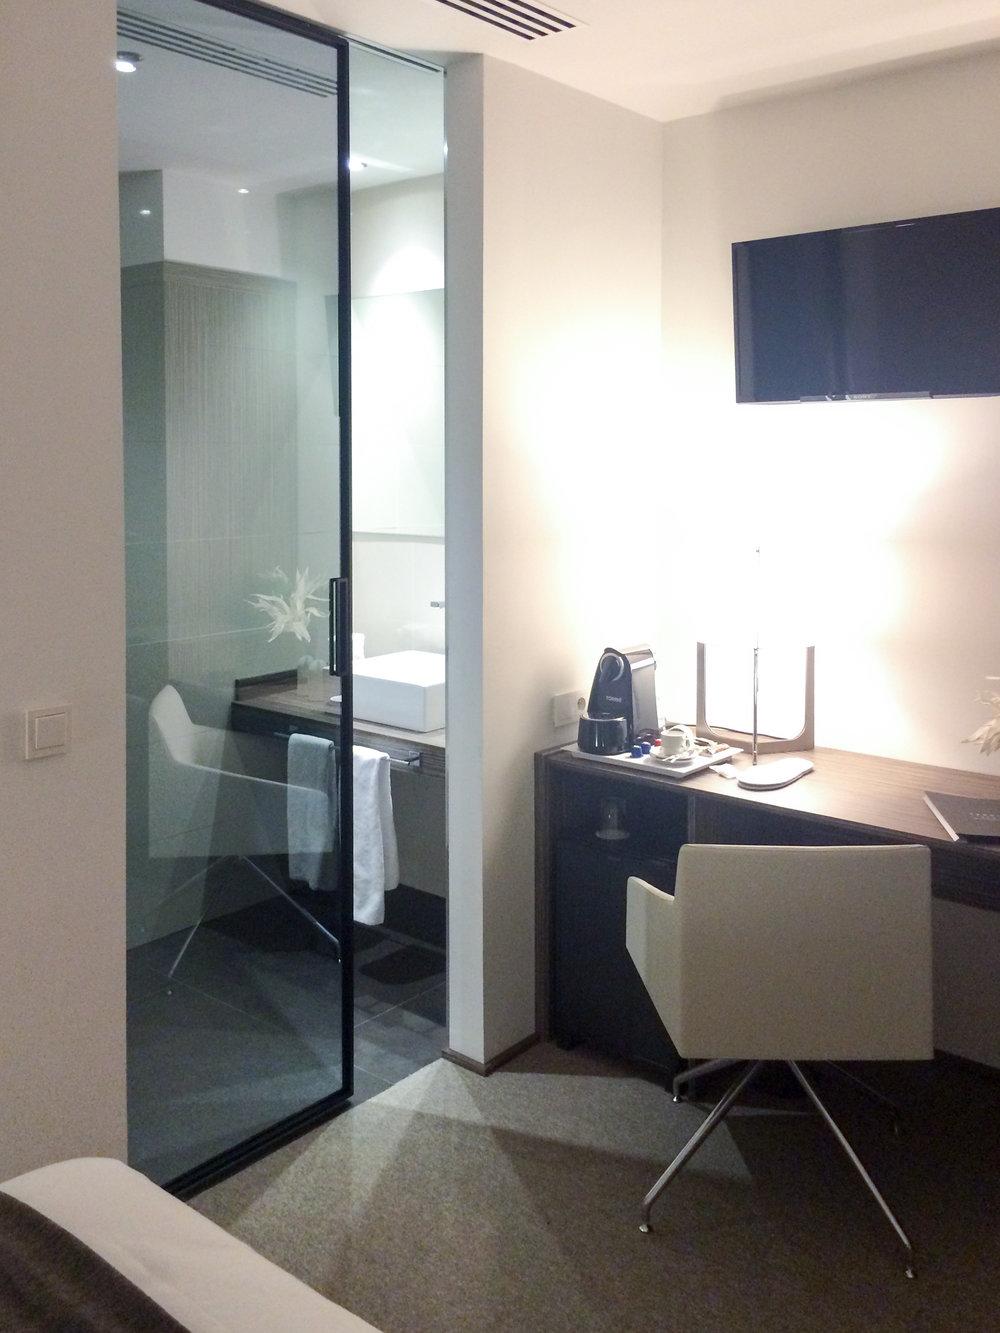 hotel_bedroom1.jpg